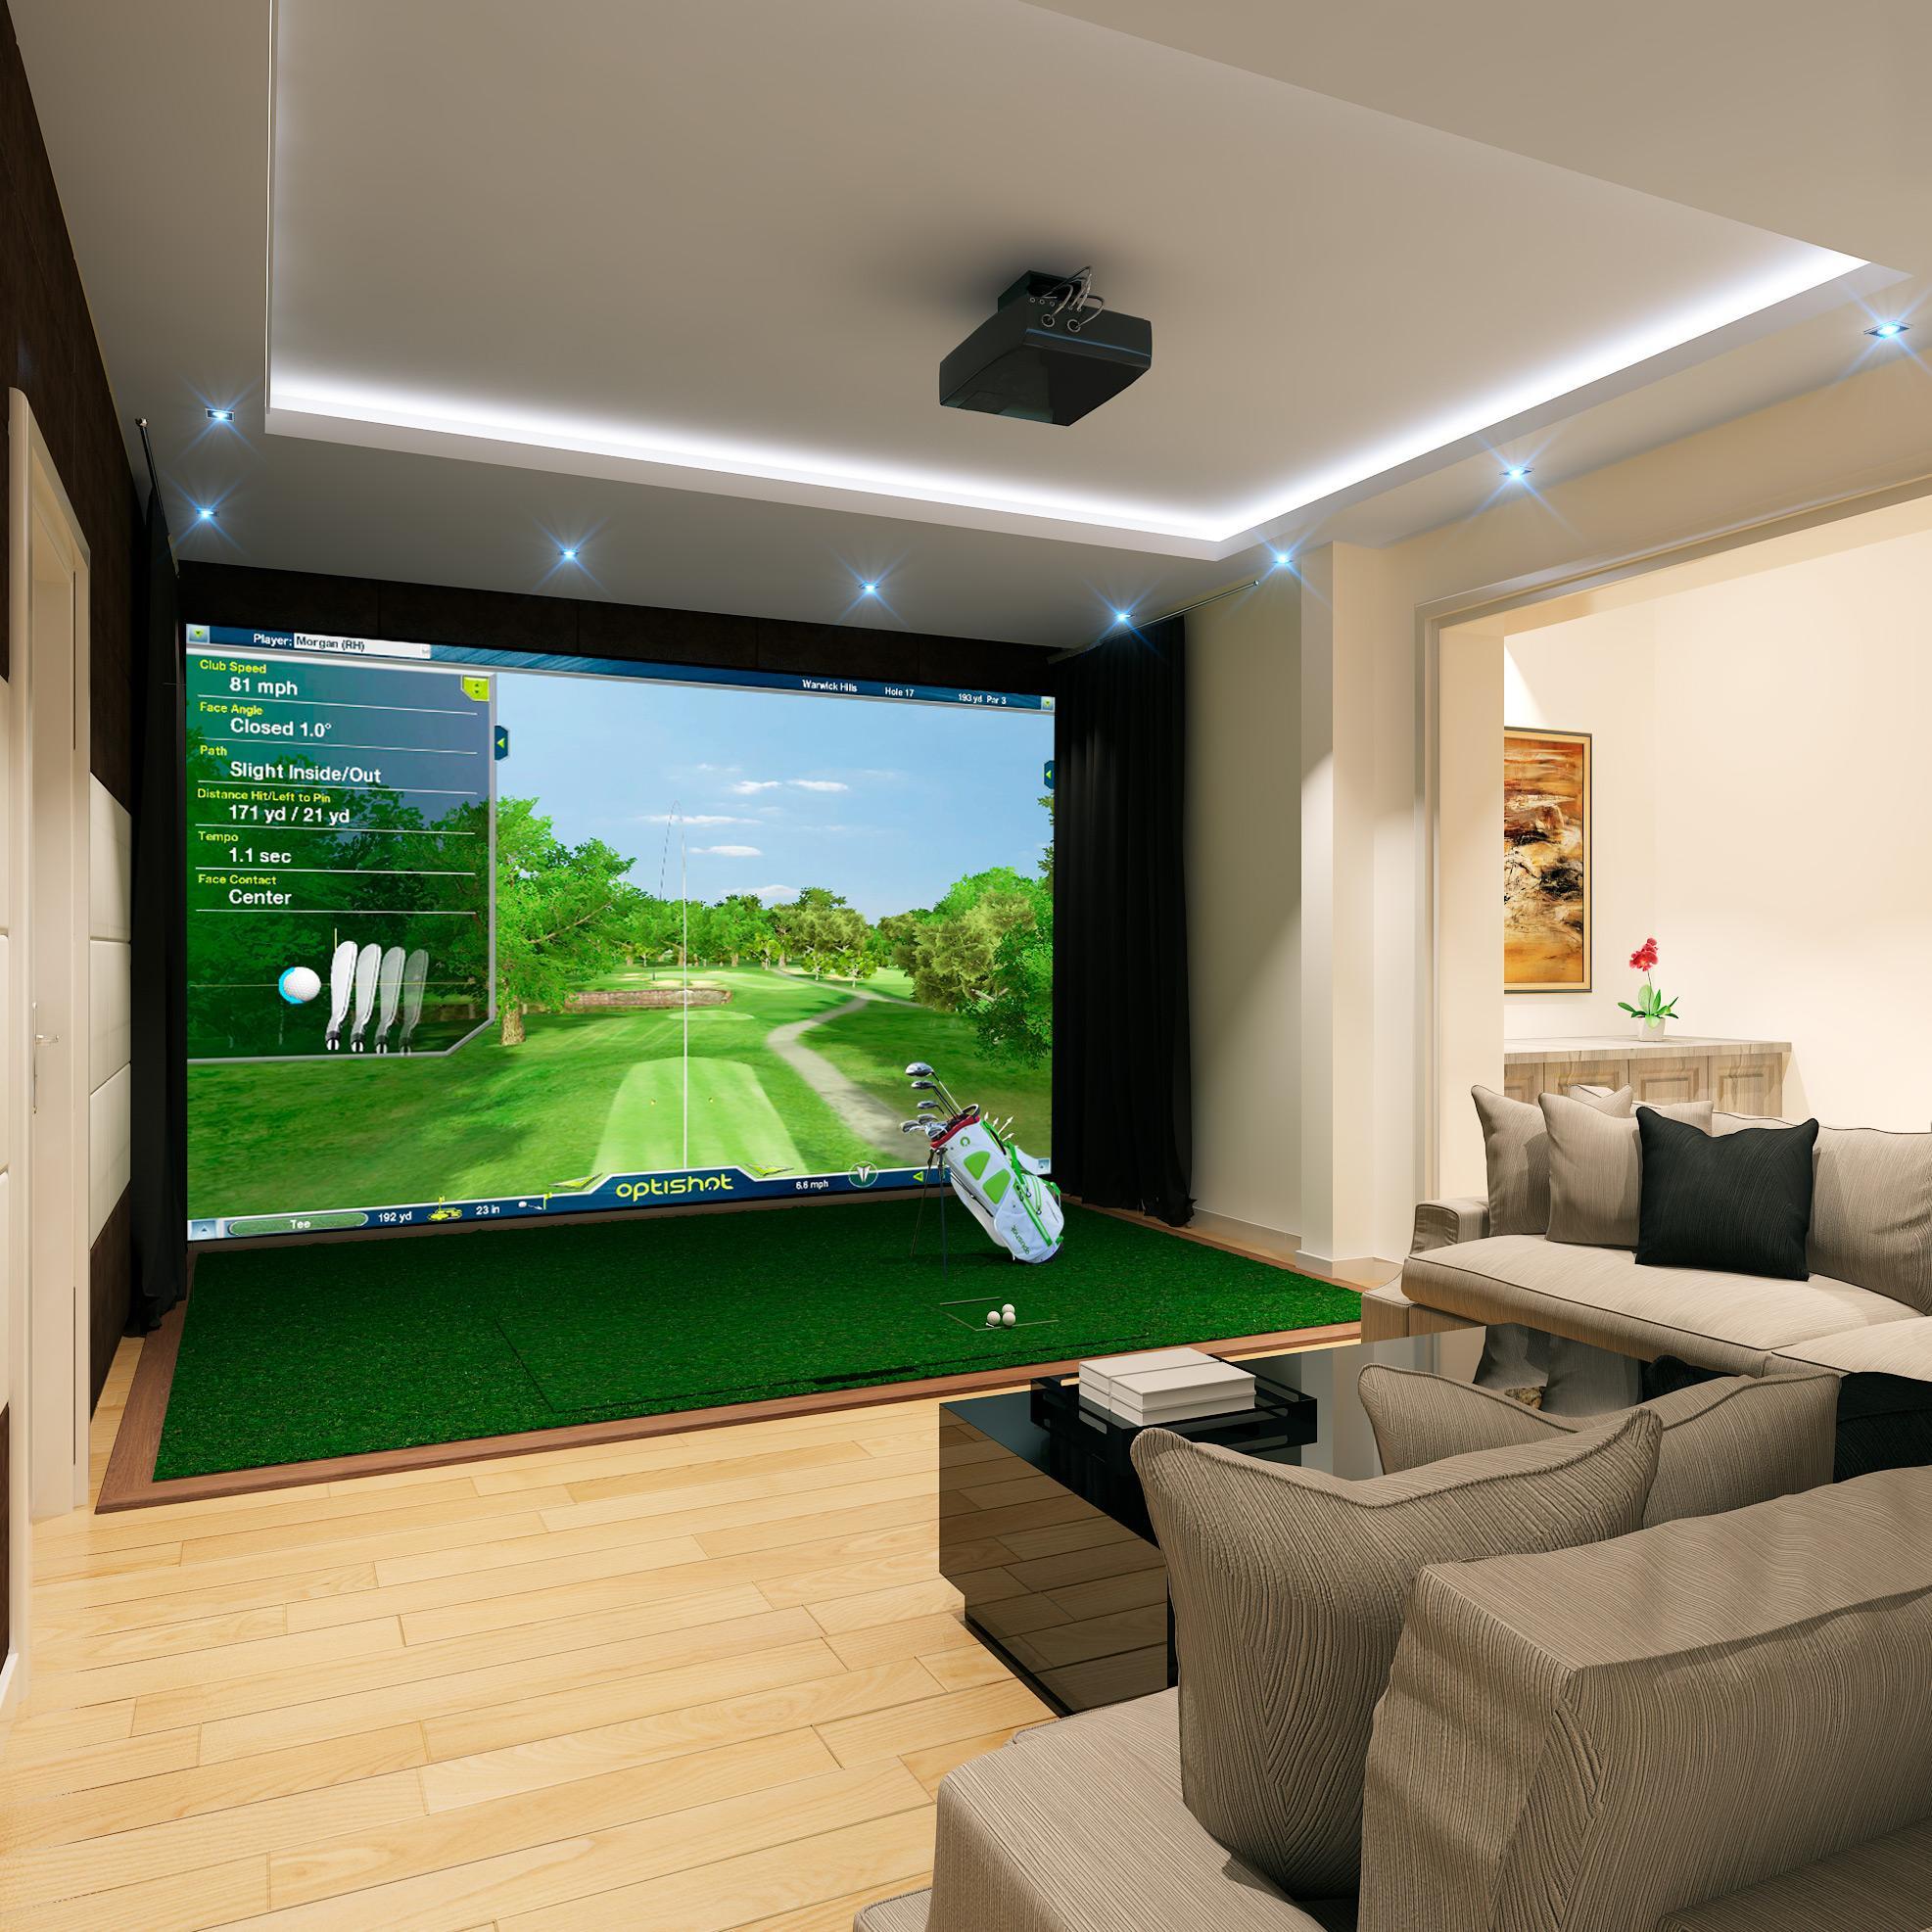 Rooms Review: Amazon.com : Optishot 2 Golf Simulator : Sports & Outdoors